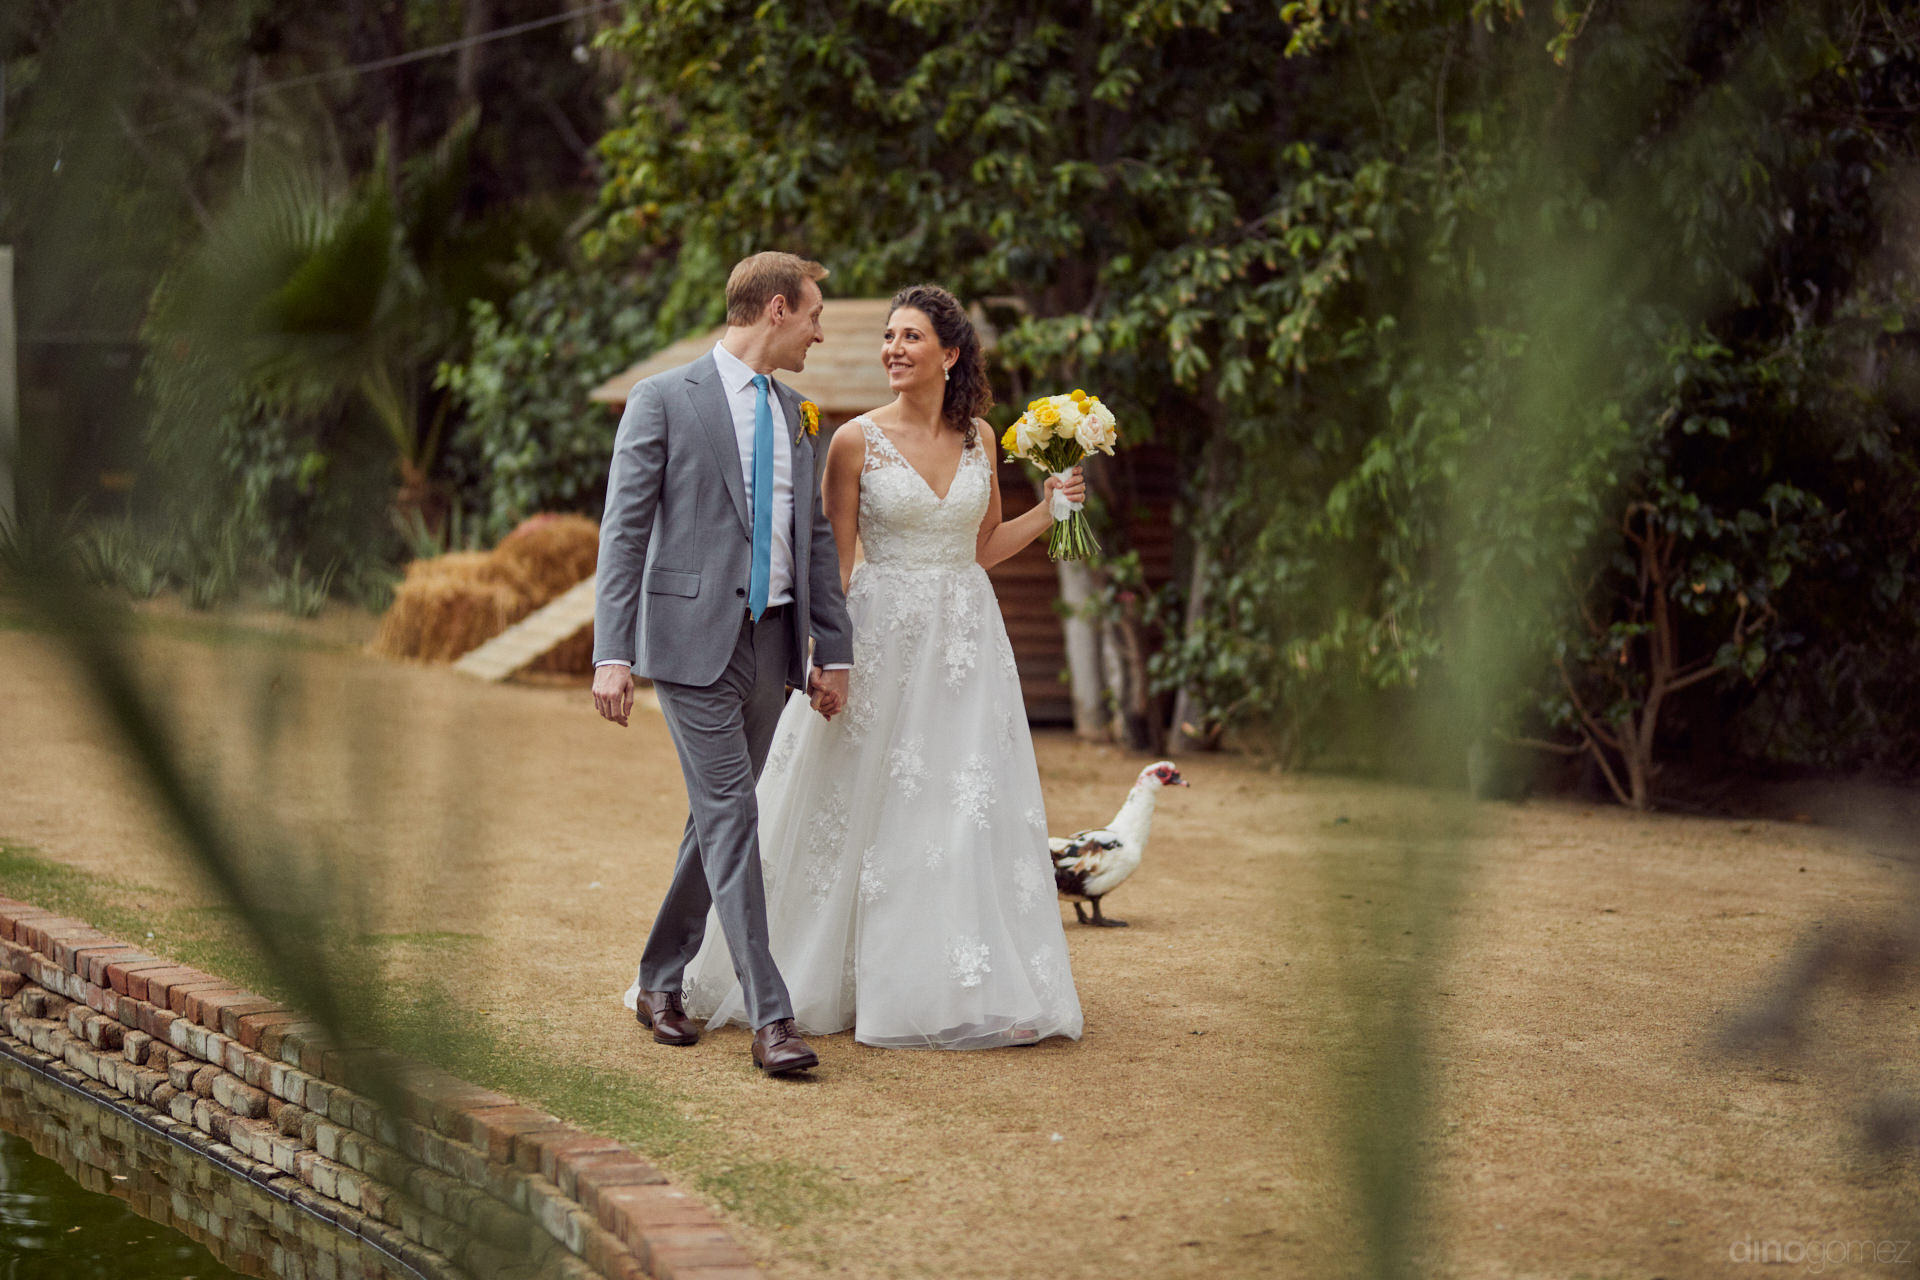 San Jose Del Cabo Weddings At Flora Farms - Hilary & Bryan Flora Wedding